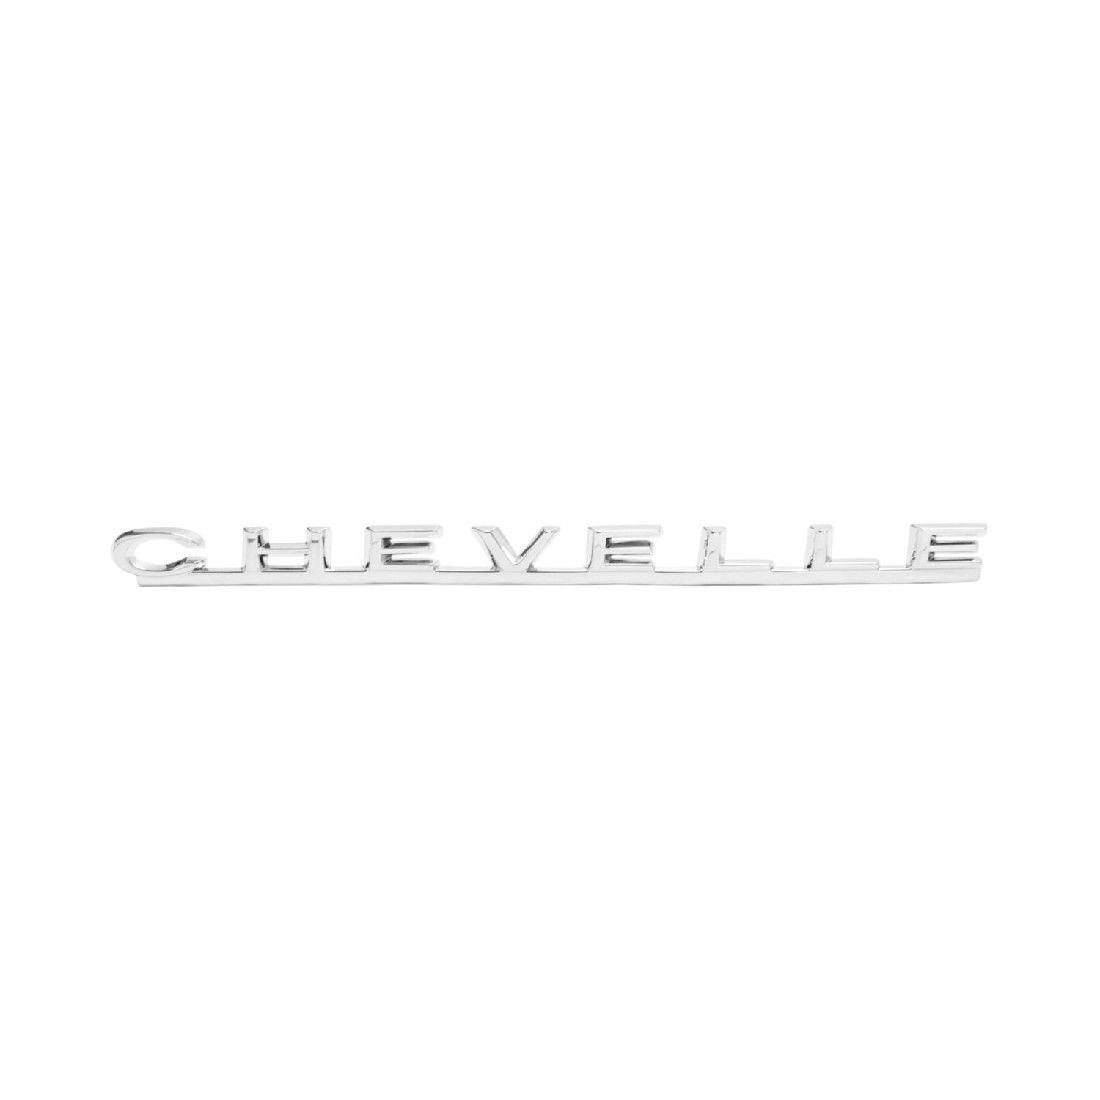 1967 Chevelle Chevrolet Hood Emblem